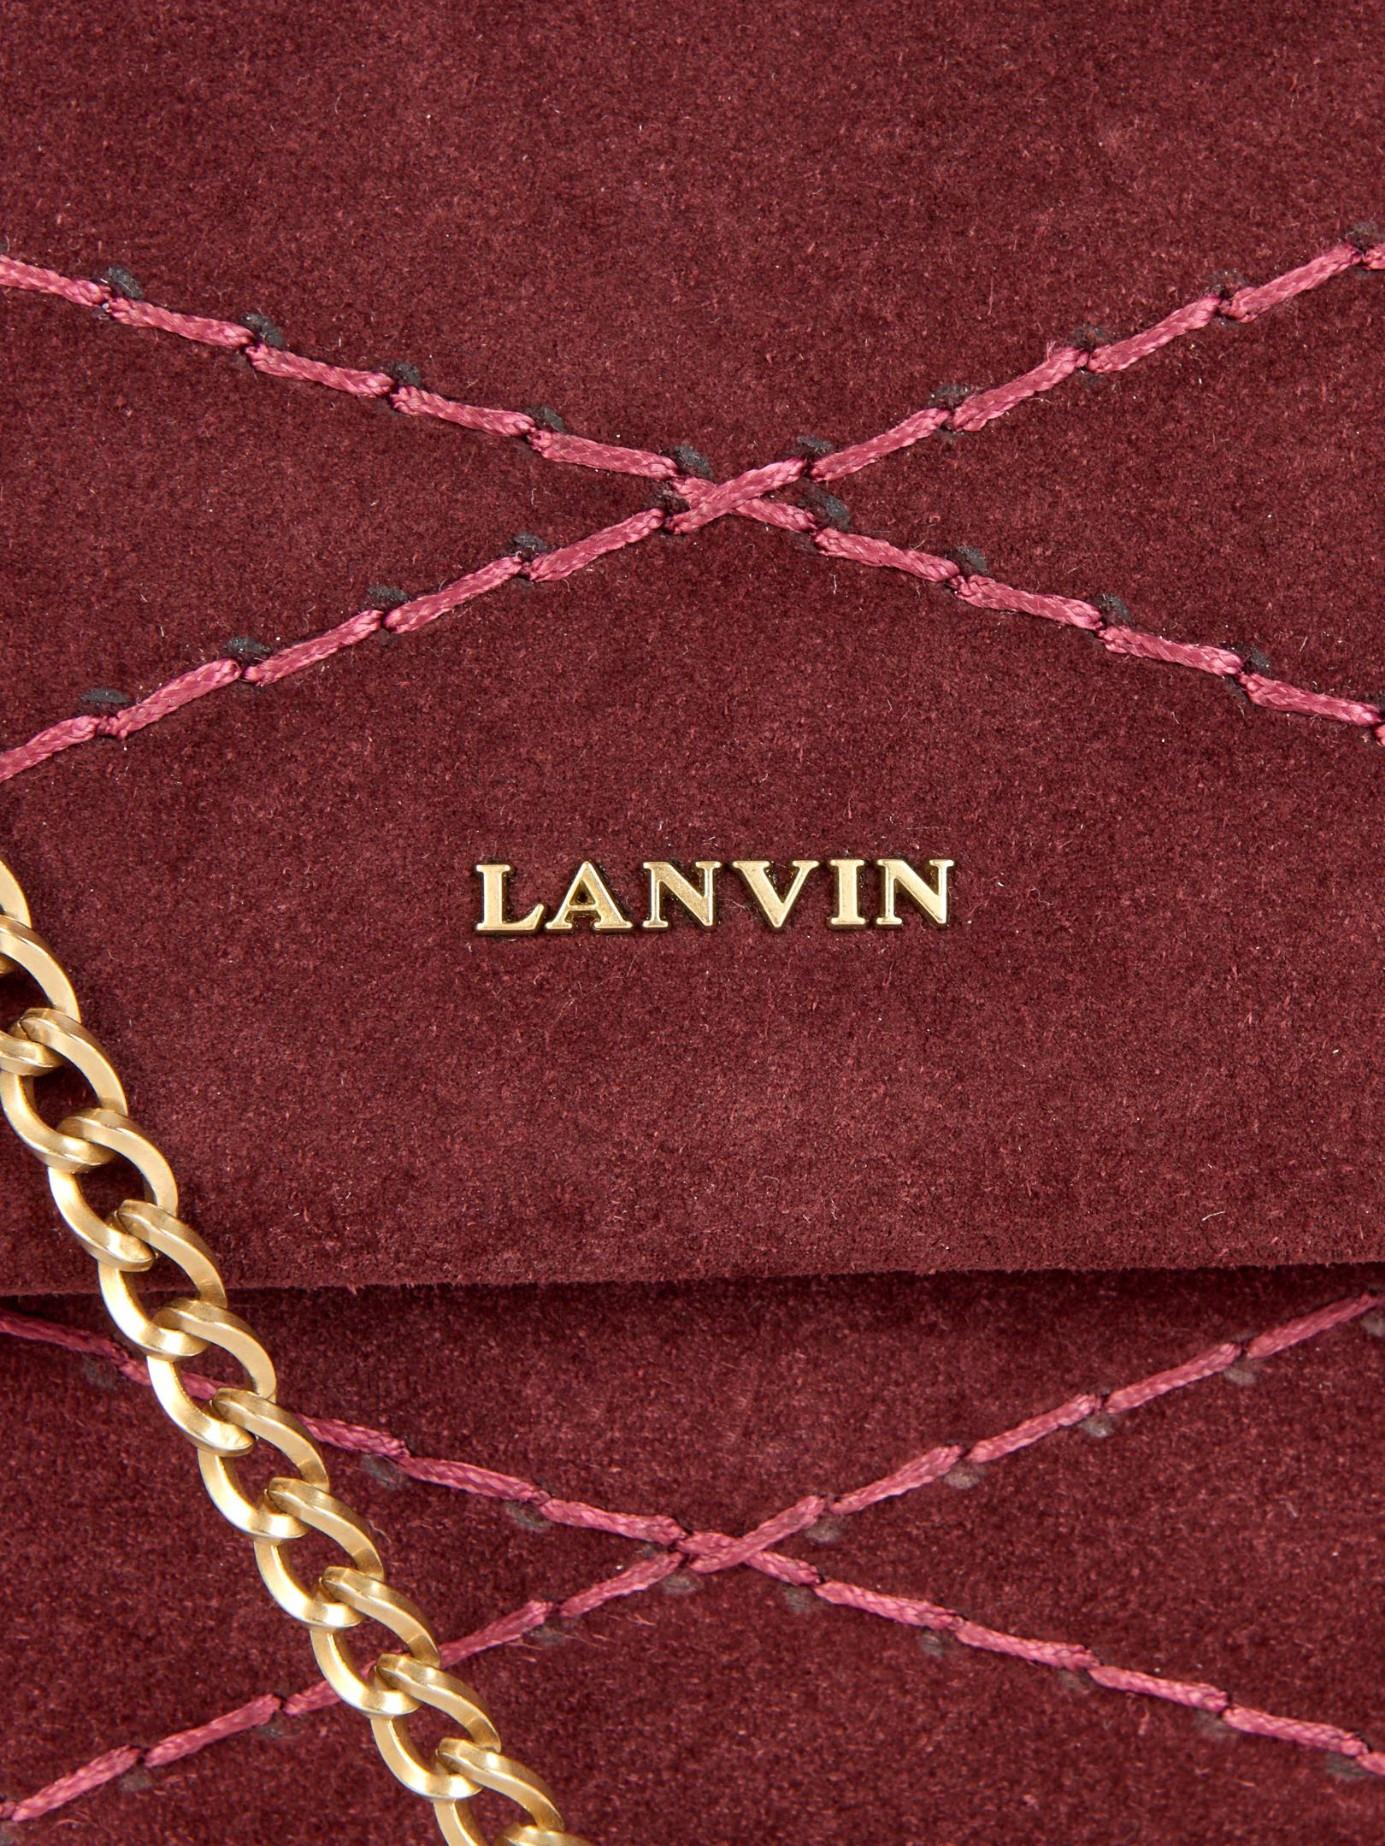 Lanvin Mini Sugar Quilted-suede Cross-body Bag in Burgundy (Purple)